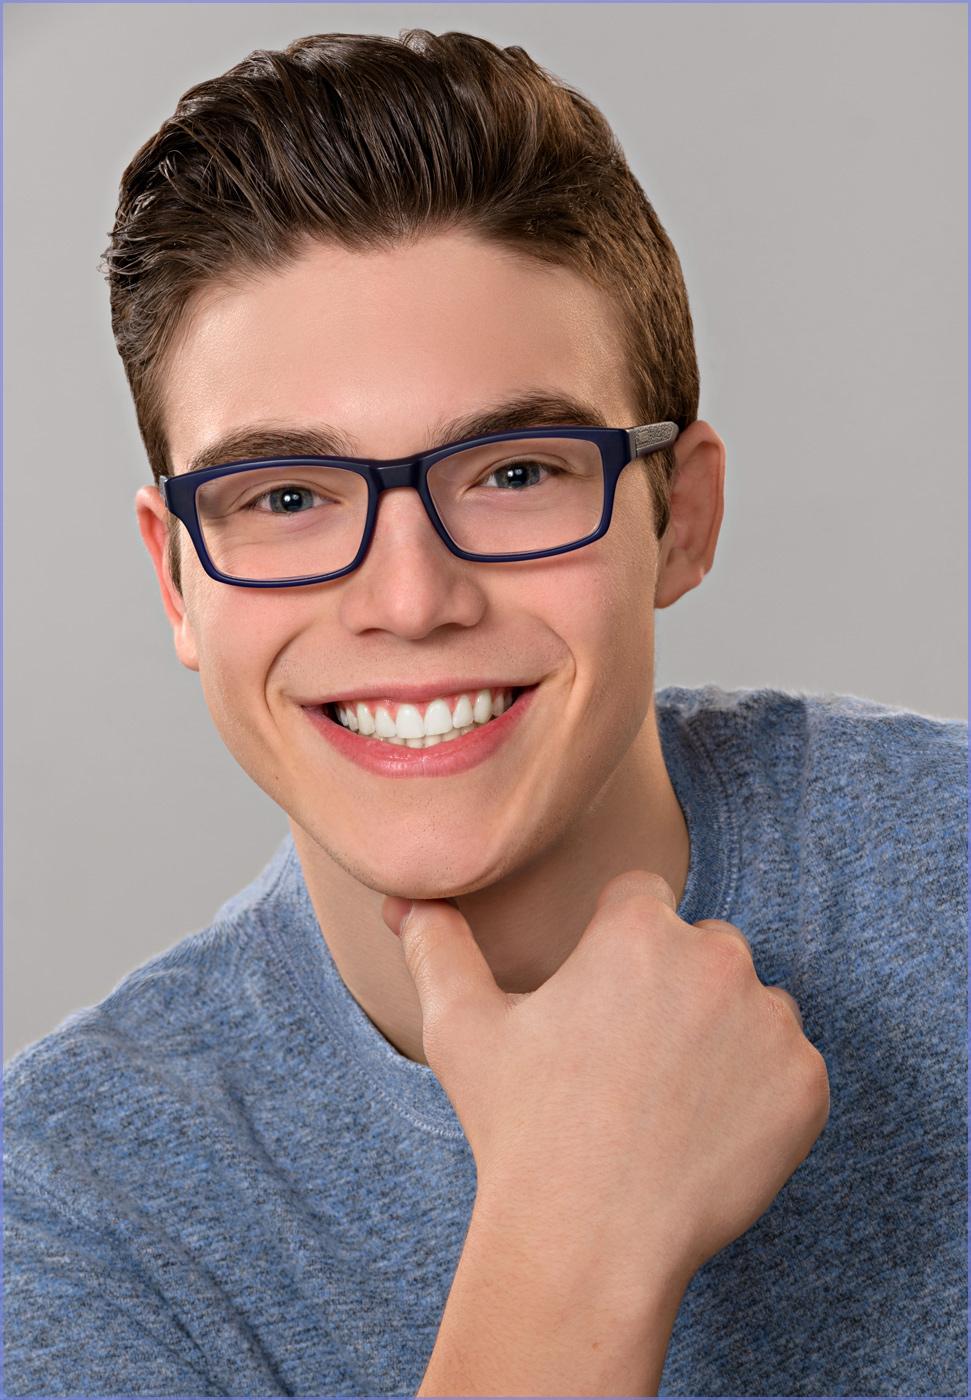 headshot of young actor model